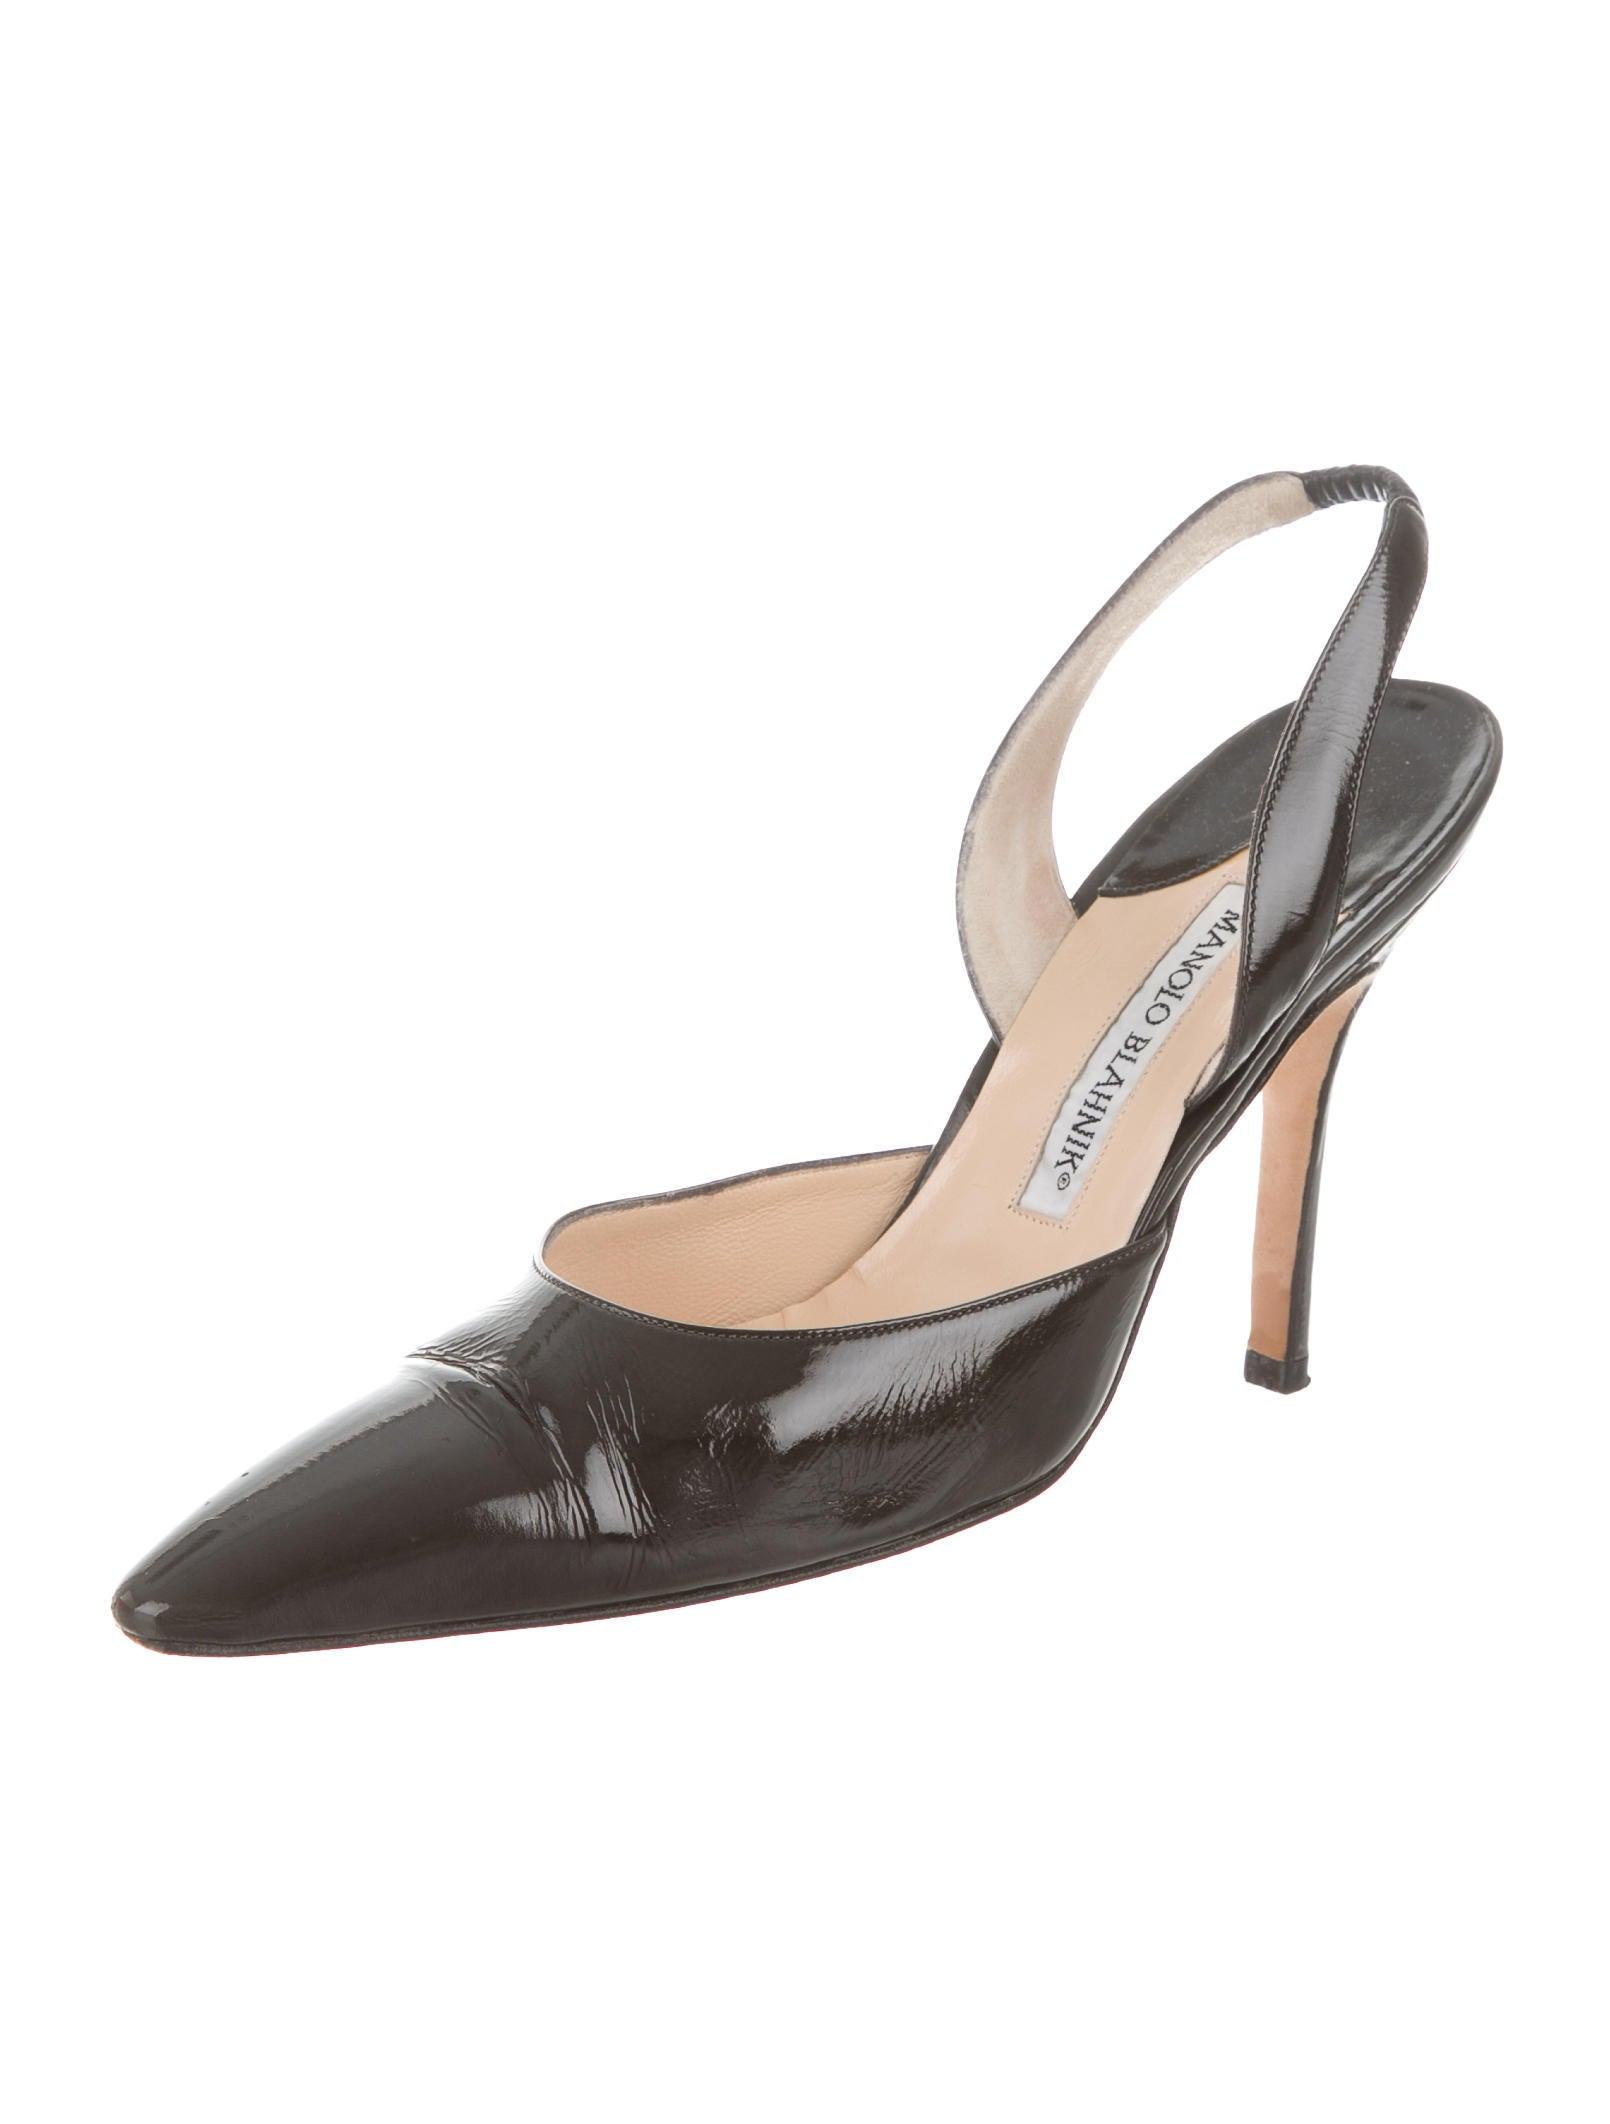 Manolo blahnik carolyne slingback pumps shoes moo60148 for Shoes by manolo blahnik